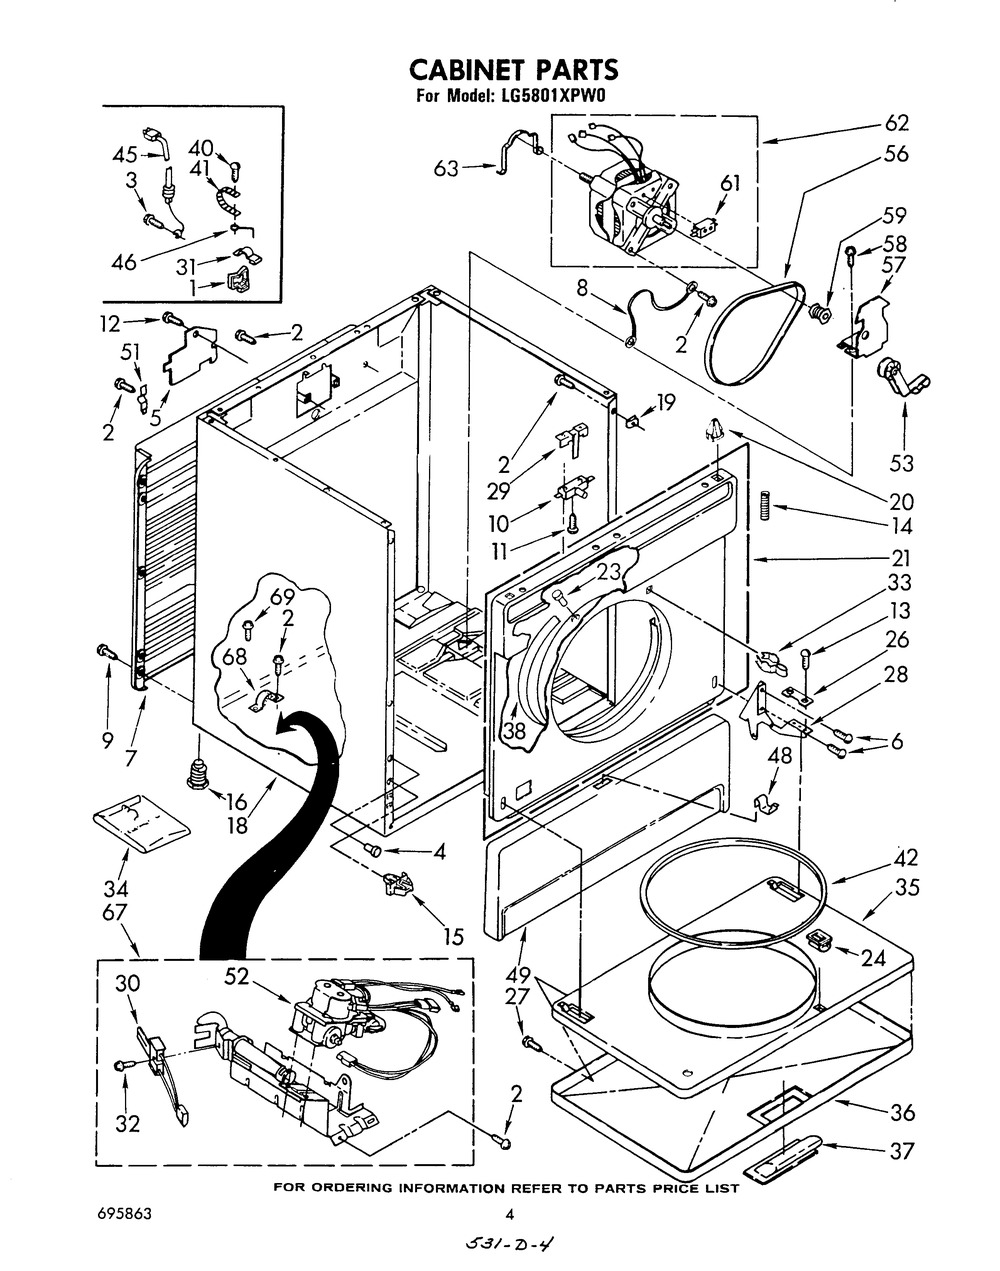 Diagram for LG5801XPW0